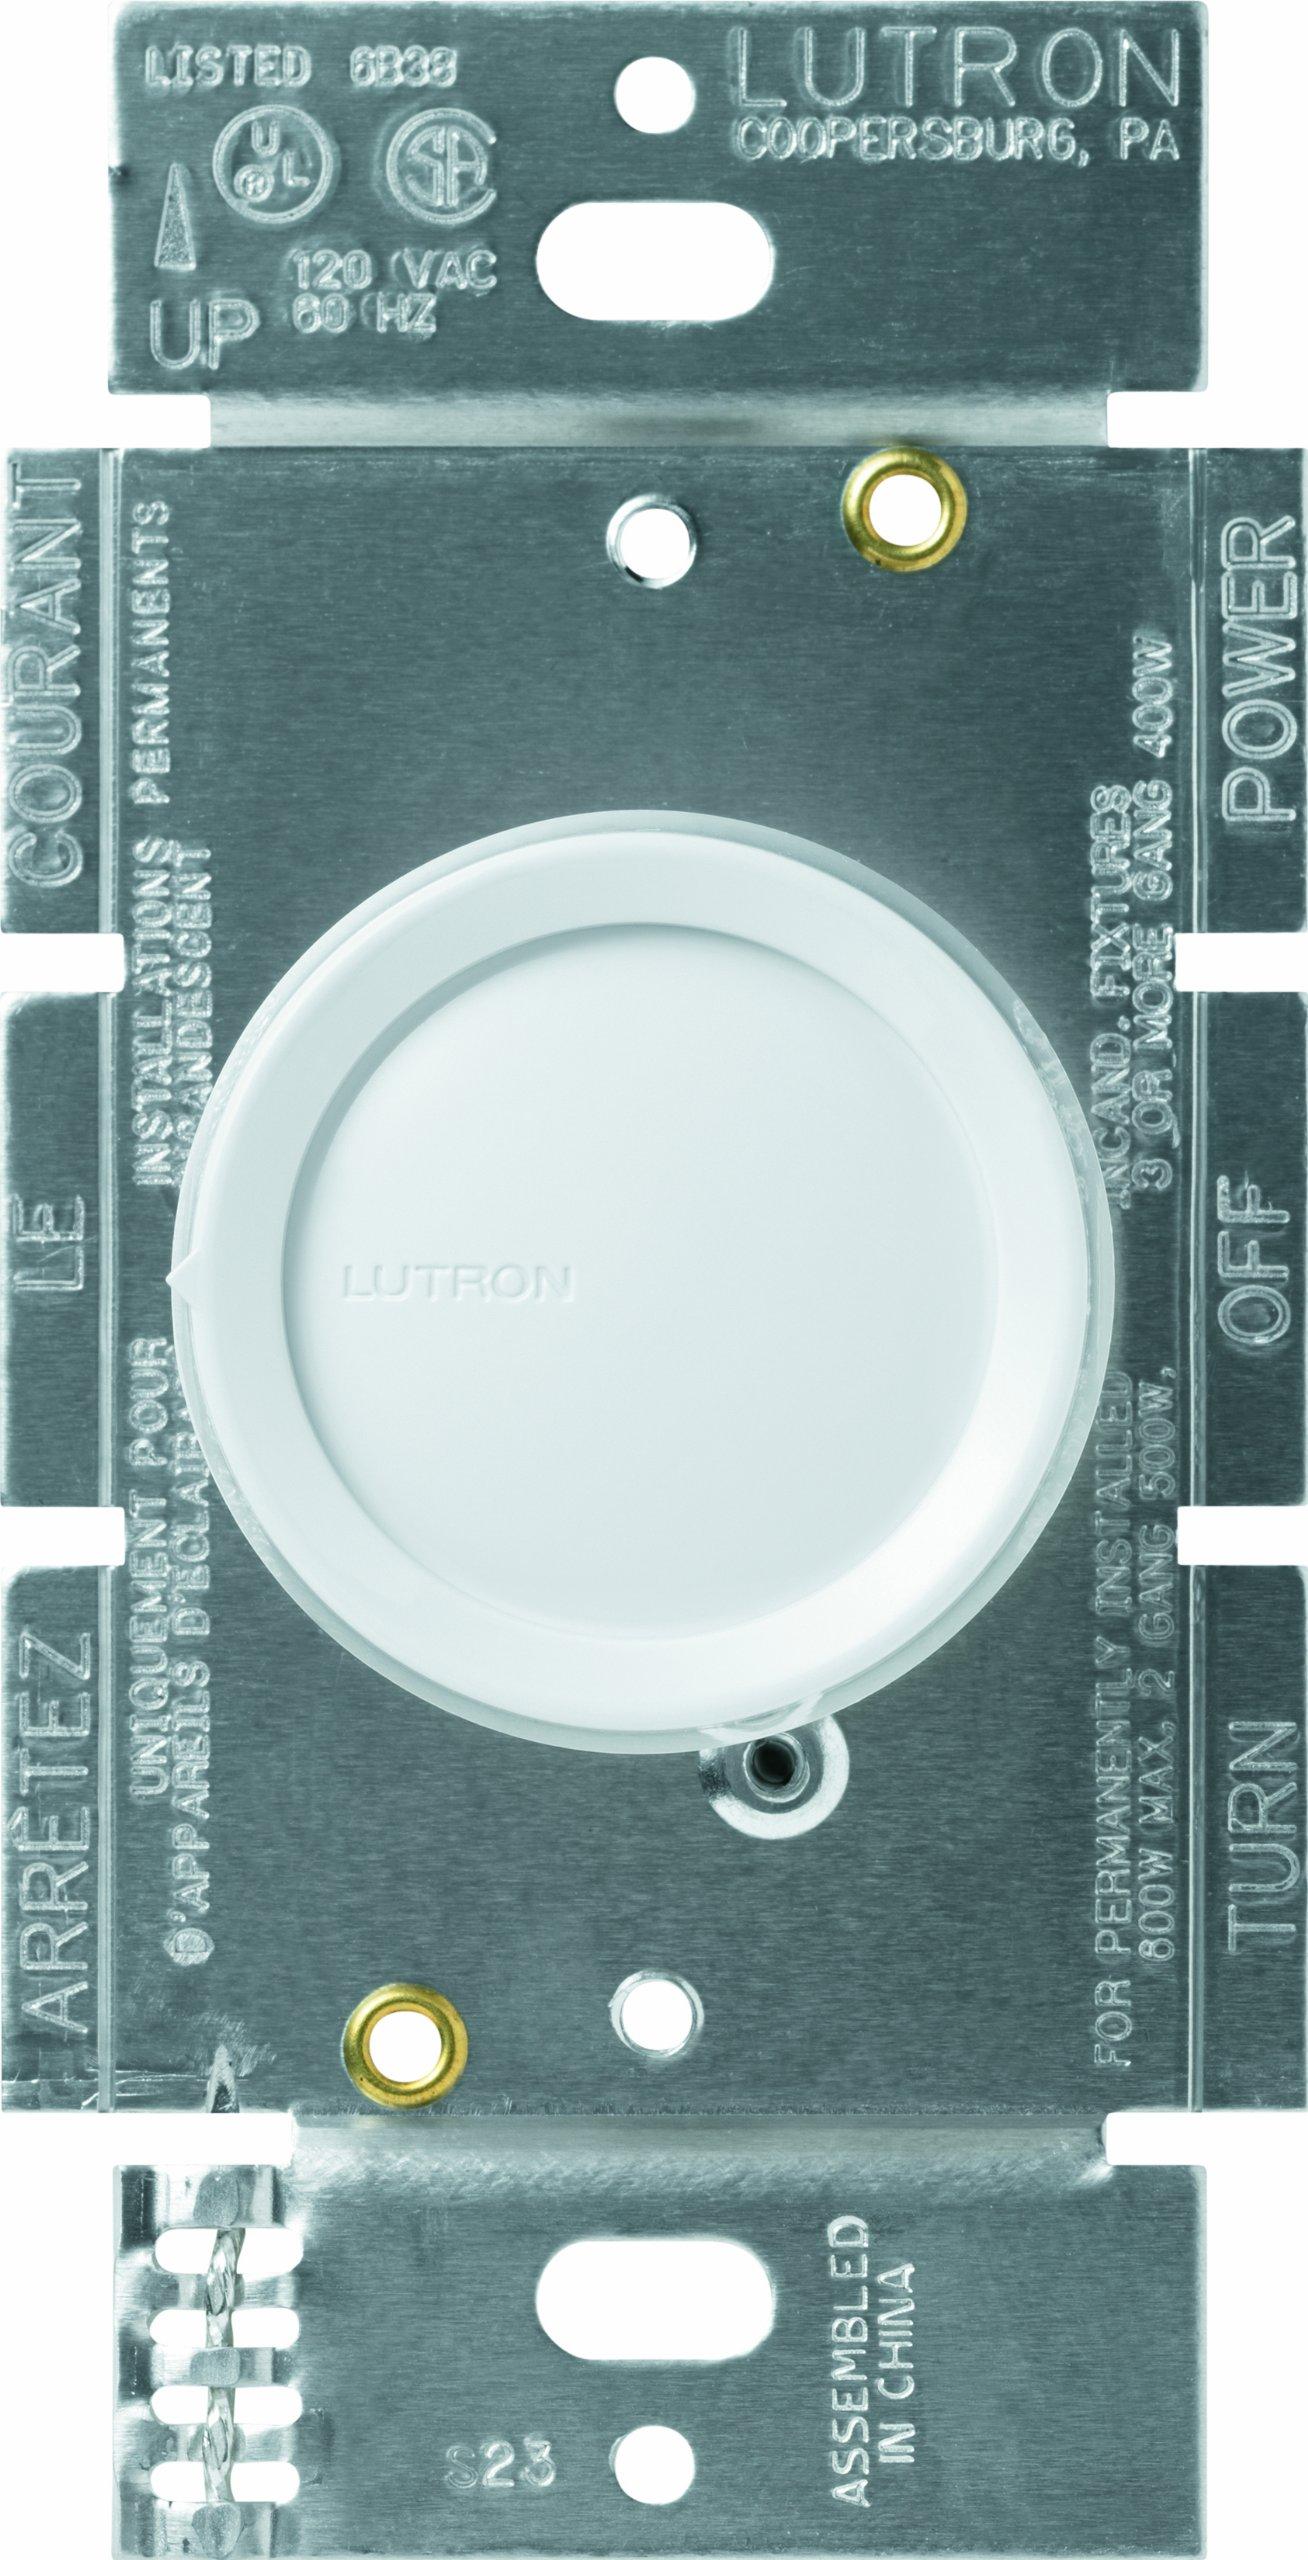 Lutron FS-5E-WH Rotary 5-Amp Single Pole Fully Variable Fan Control, White